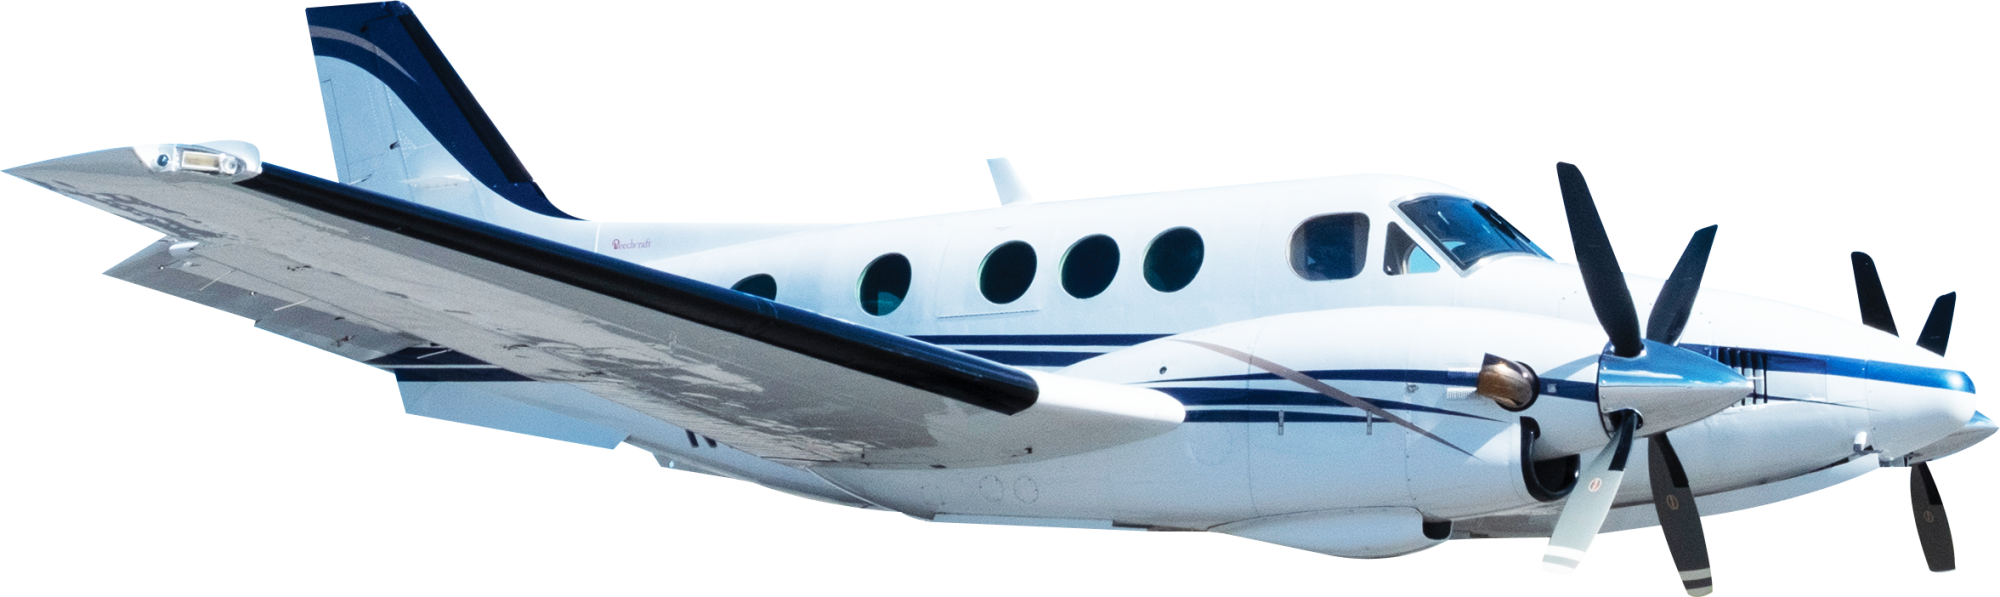 Photo of King Air 90